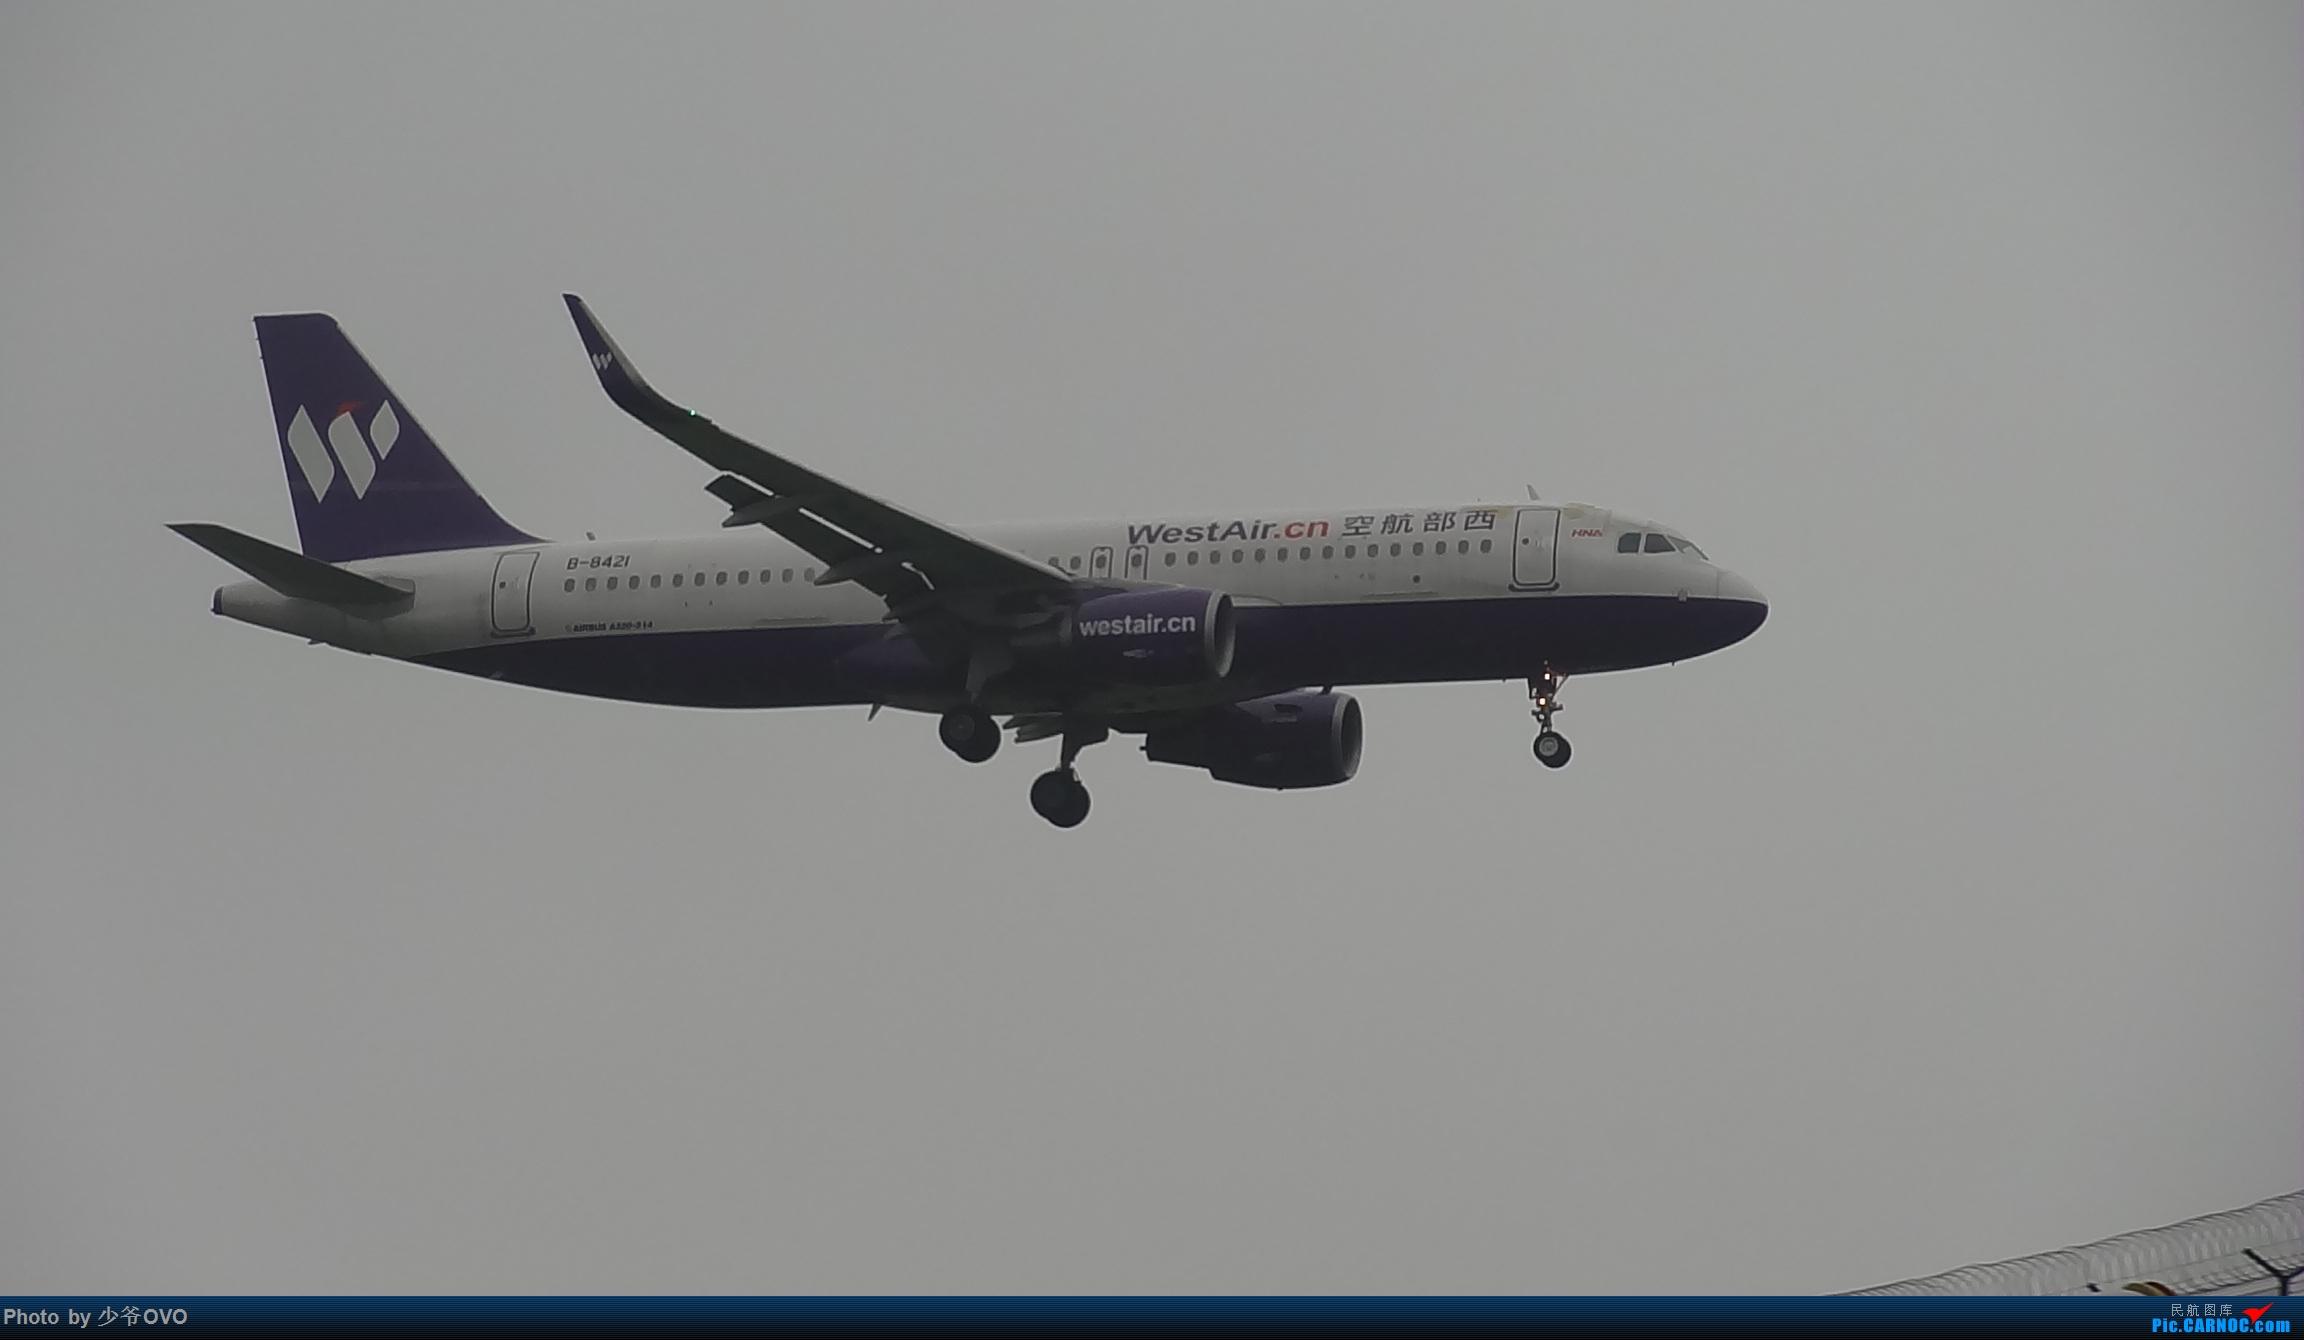 Re:[原创]CKG重庆江北机场拍机 ,渣图一堆,多指点 AIRBUS A320-200 B-8421 中国重庆江北国际机场